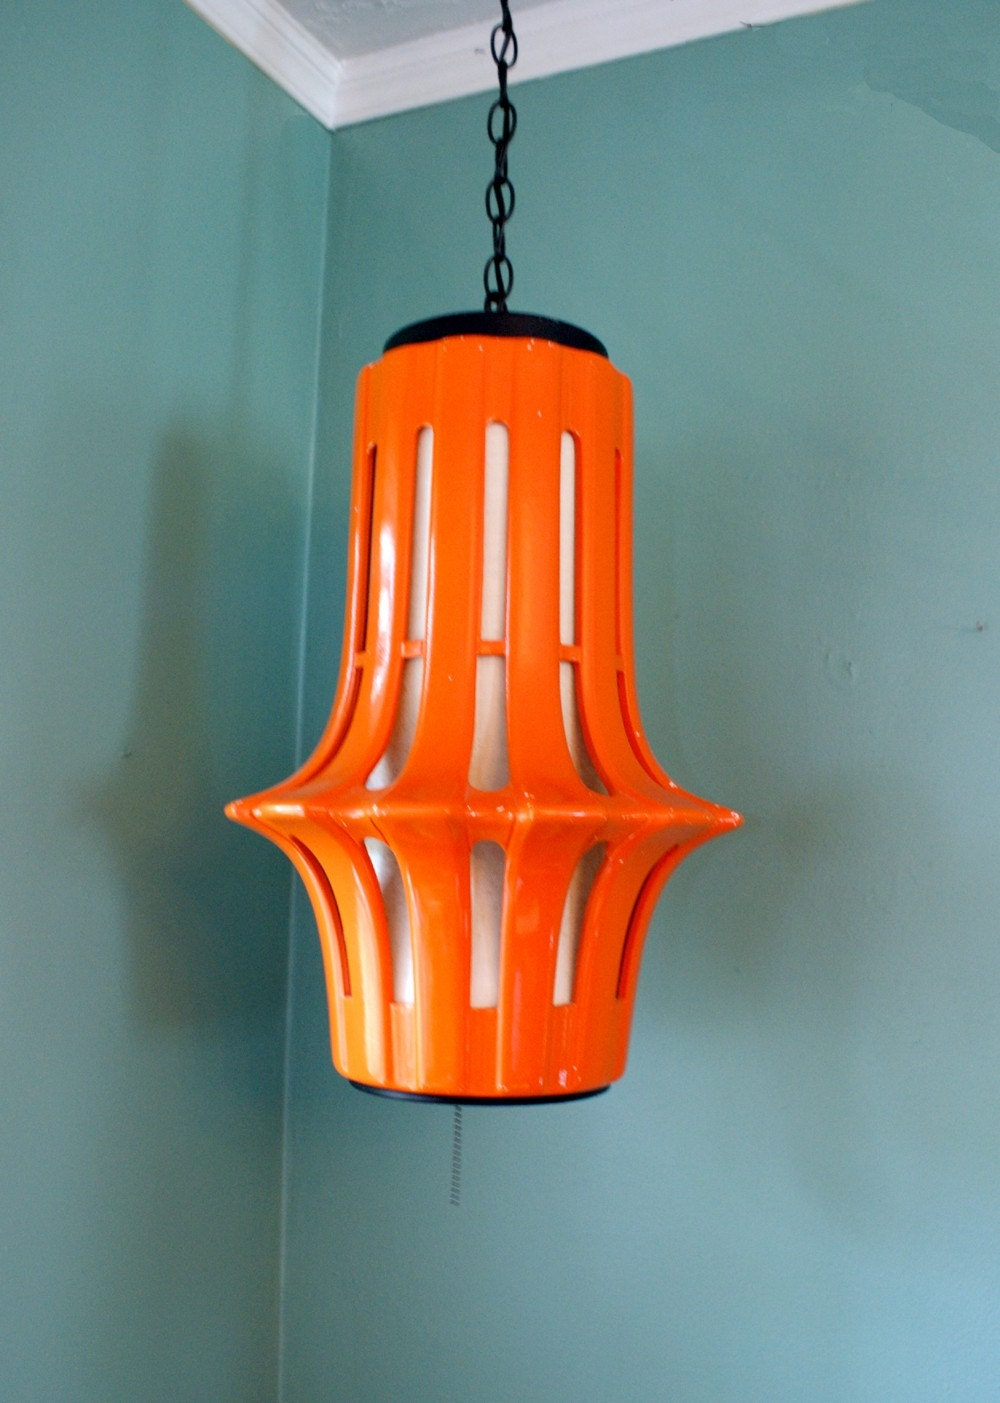 Vintage Orange Ceramic Hanging Swag Lamp Fixture 1960s Mod